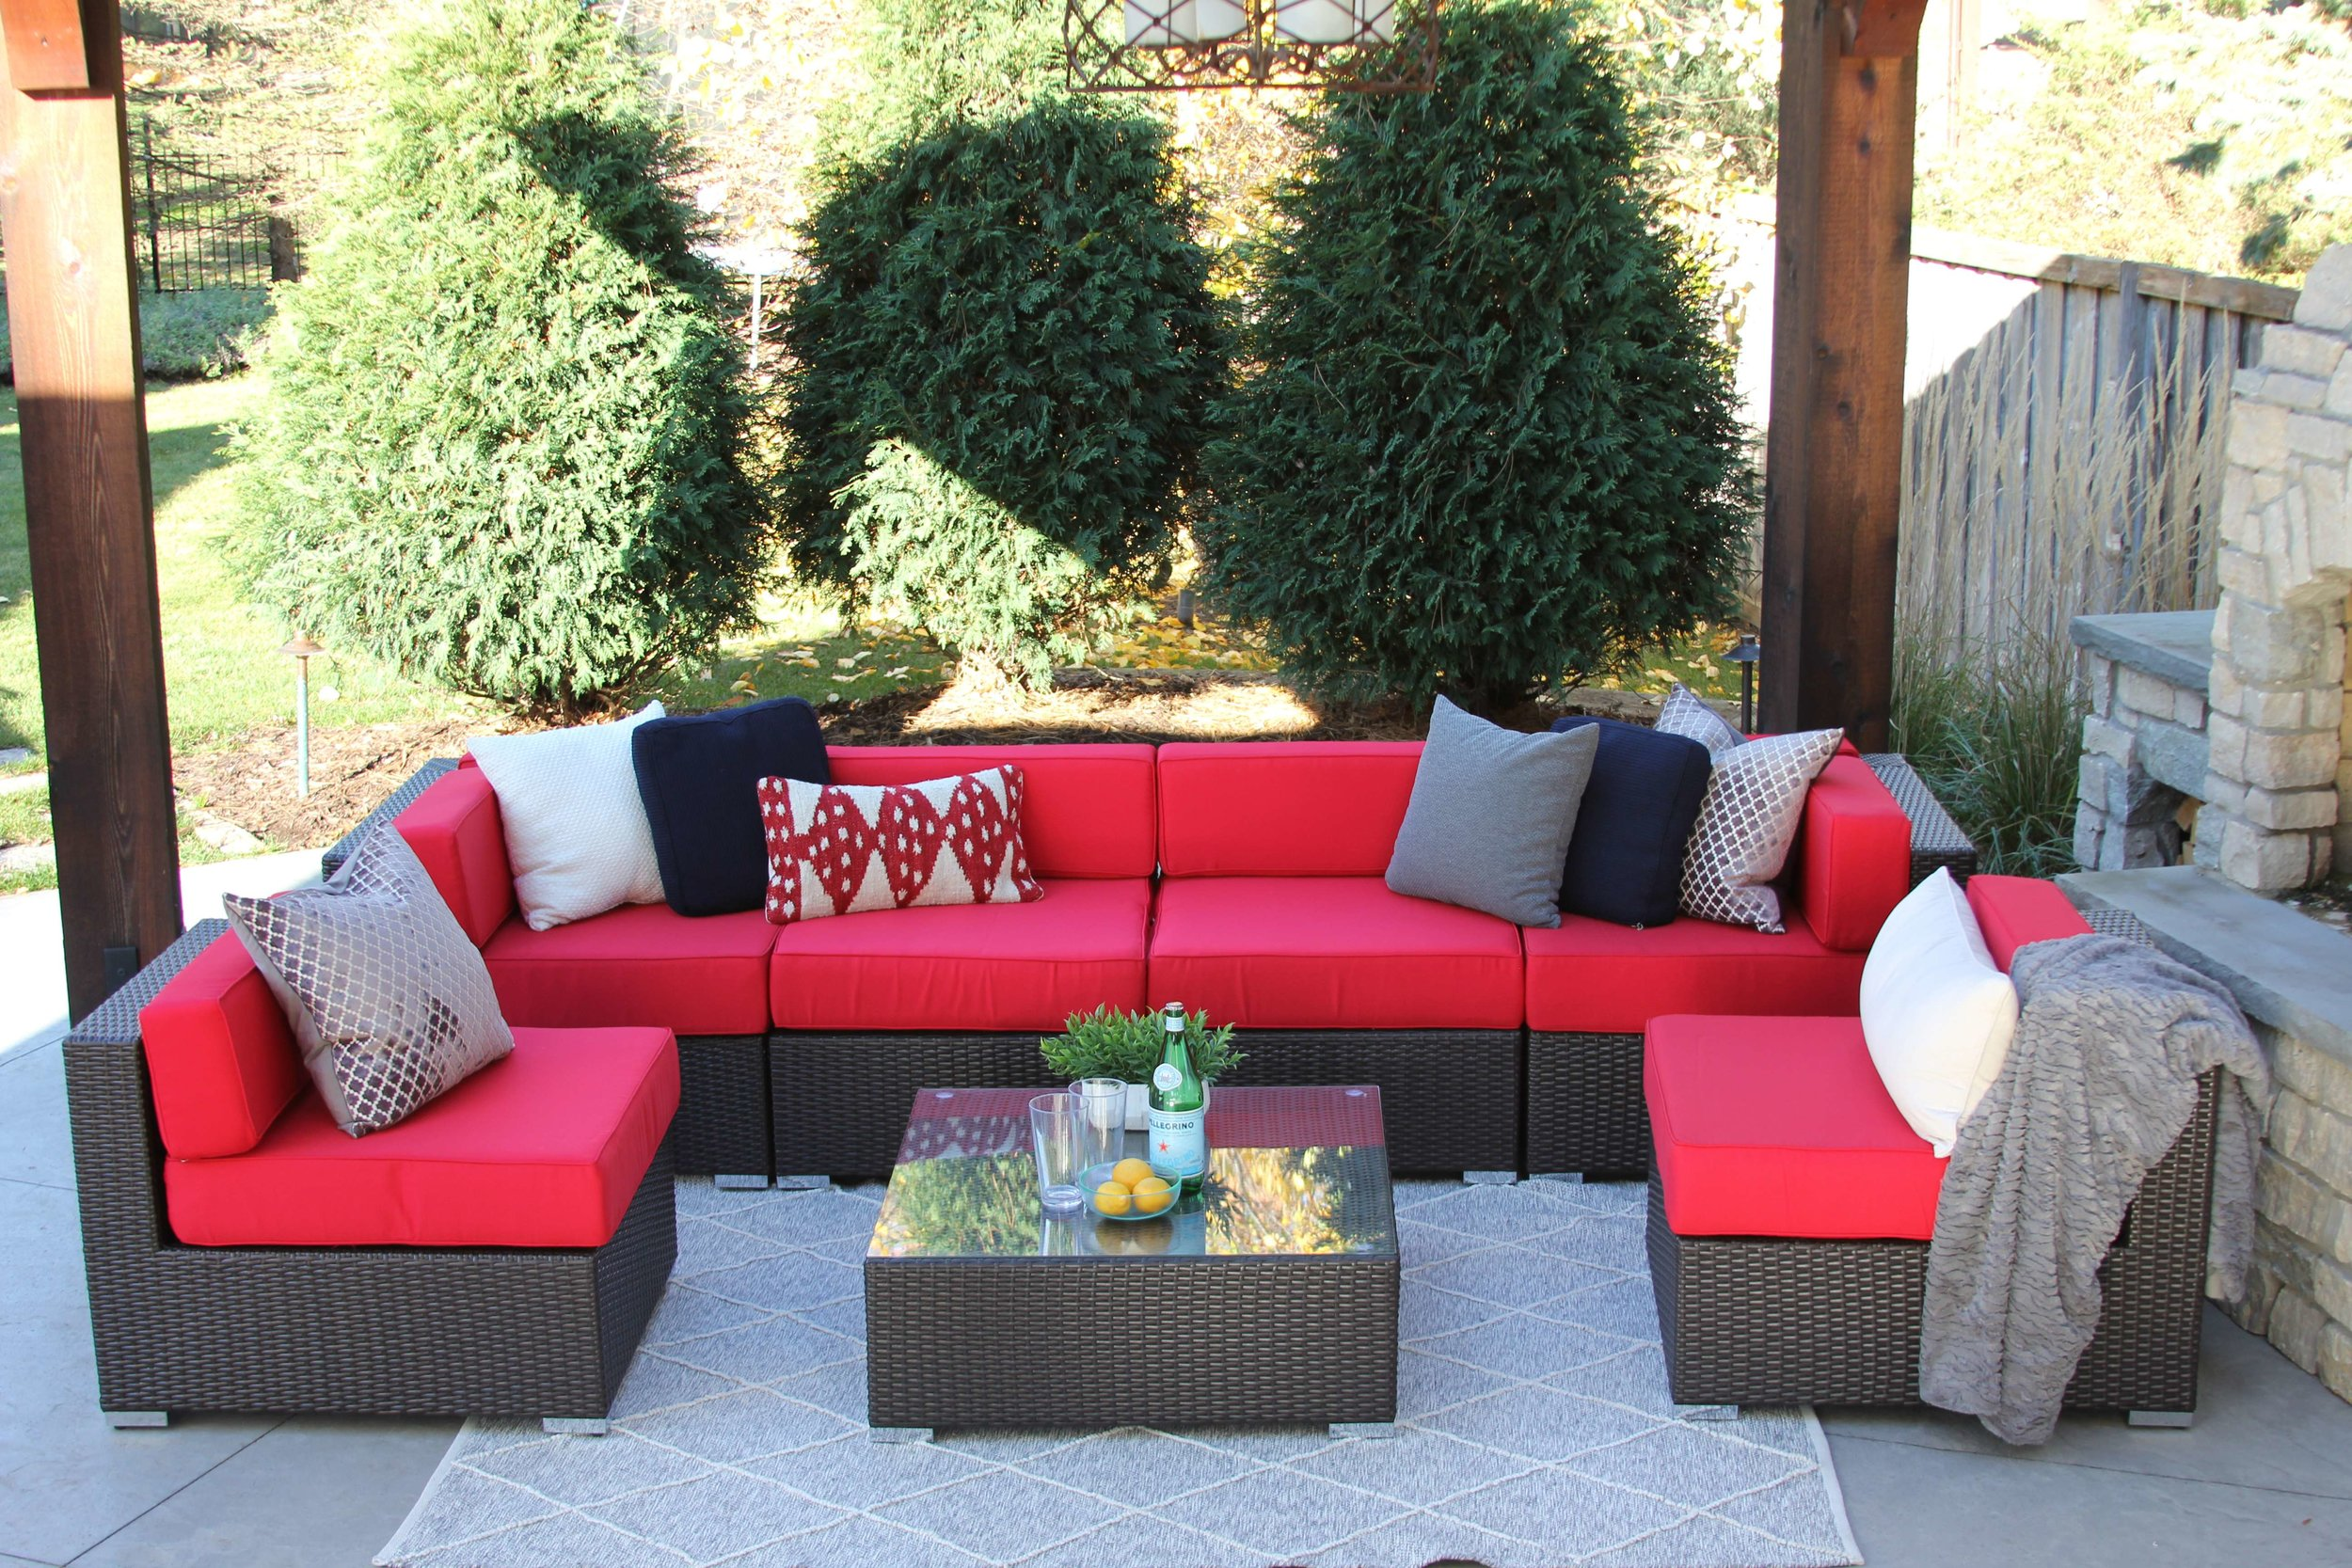 Damen 7 Piece Wicker Sectional Sofa Set